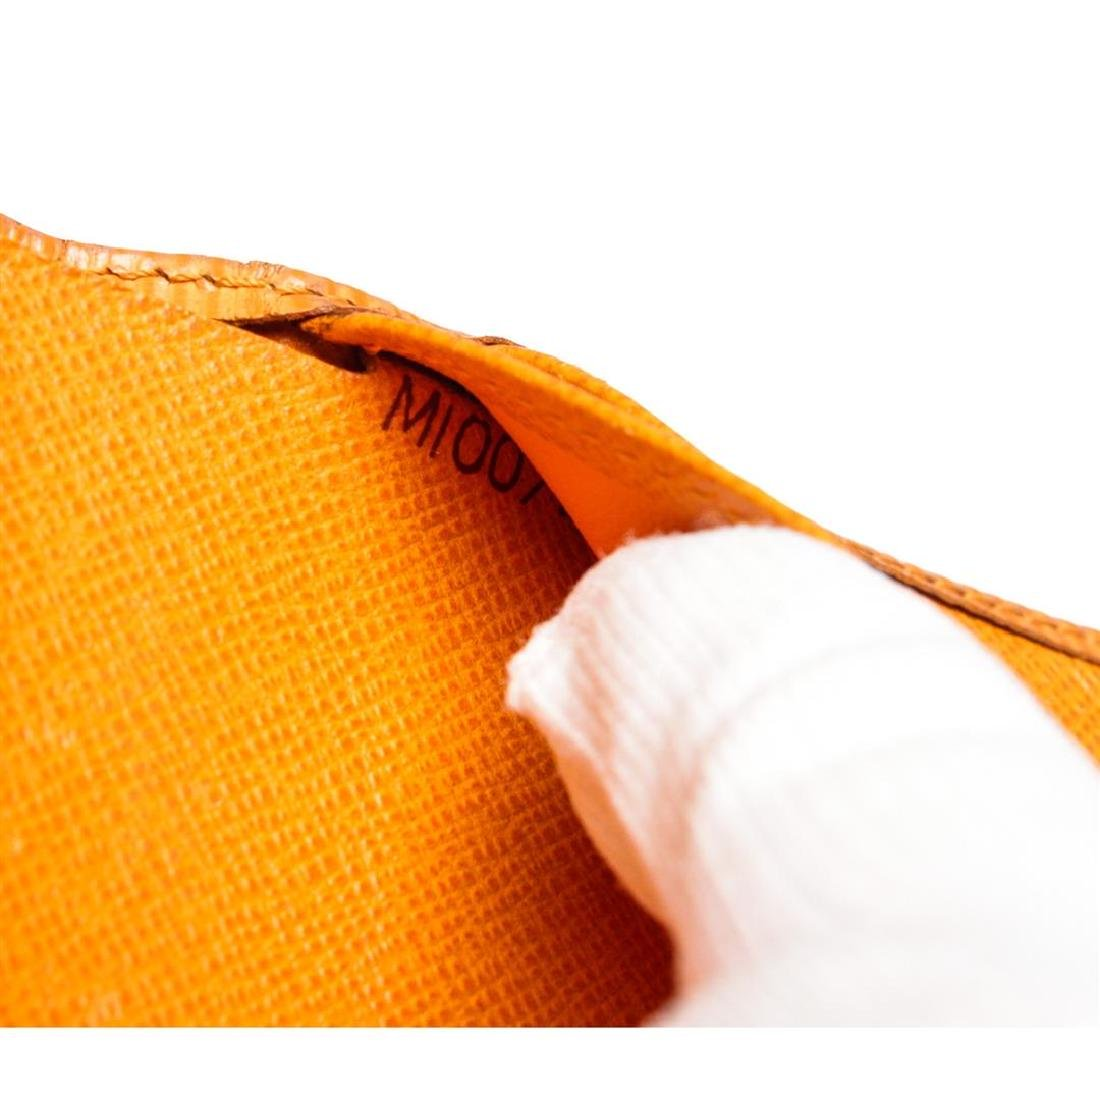 Louis Vuitton Orange Epi Leather French Purse Wallet - 7